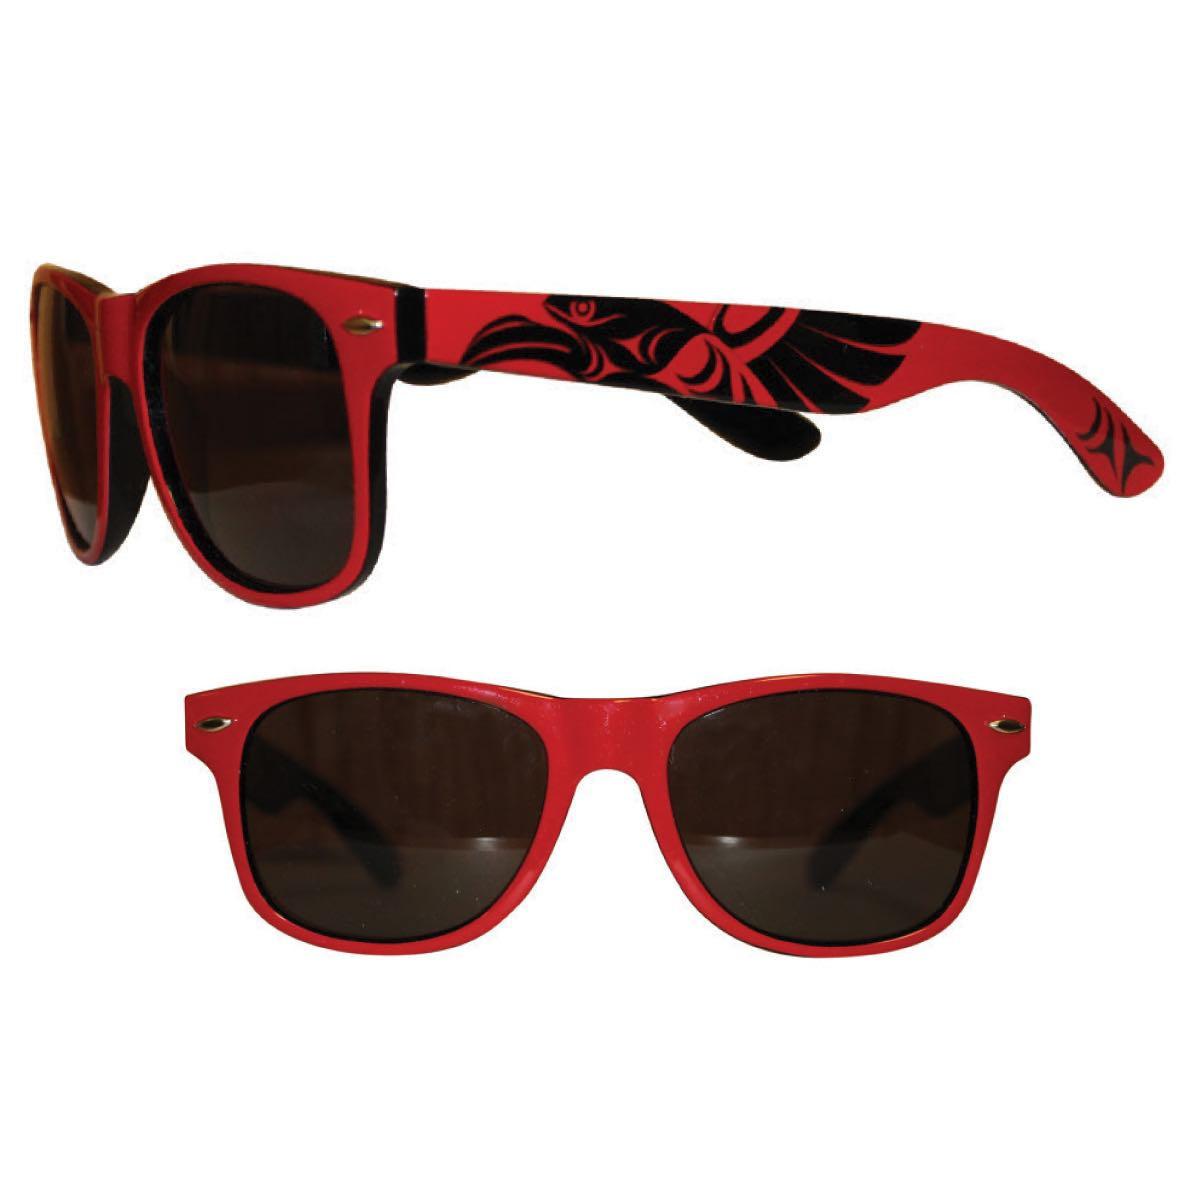 SunGlasses - Adult-12